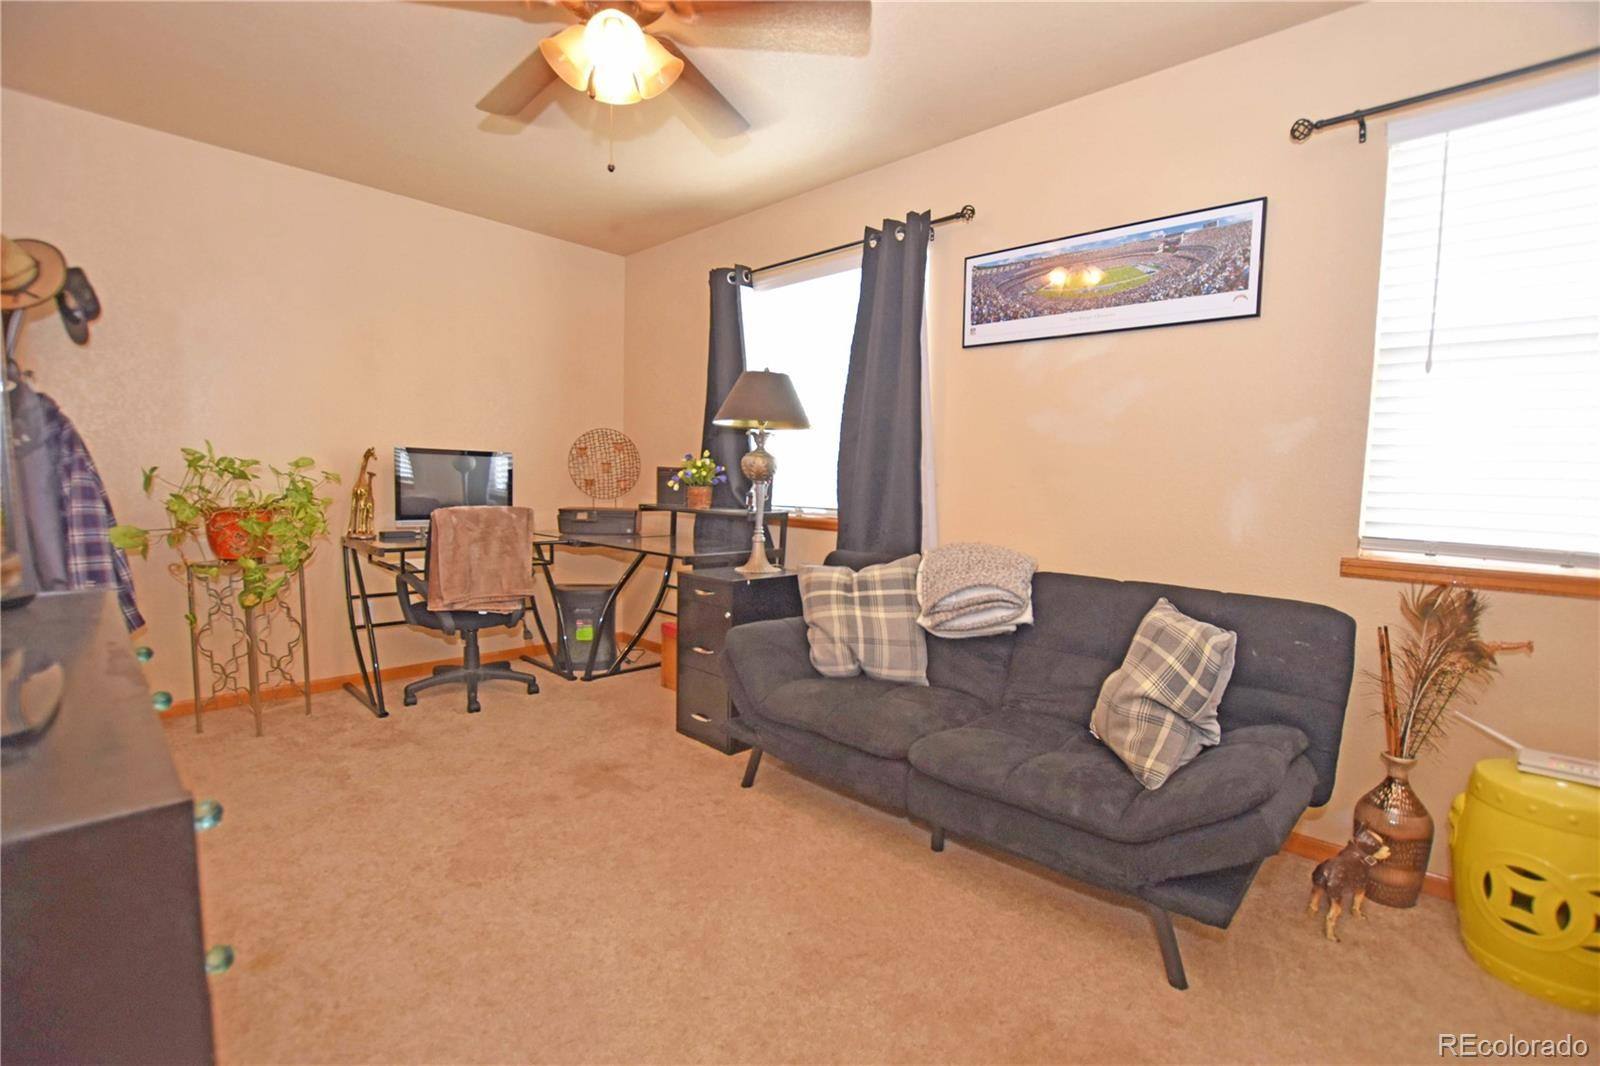 MLS# 9206879 - 25 - 3924 Eagles Nest Drive, Evans, CO 80620